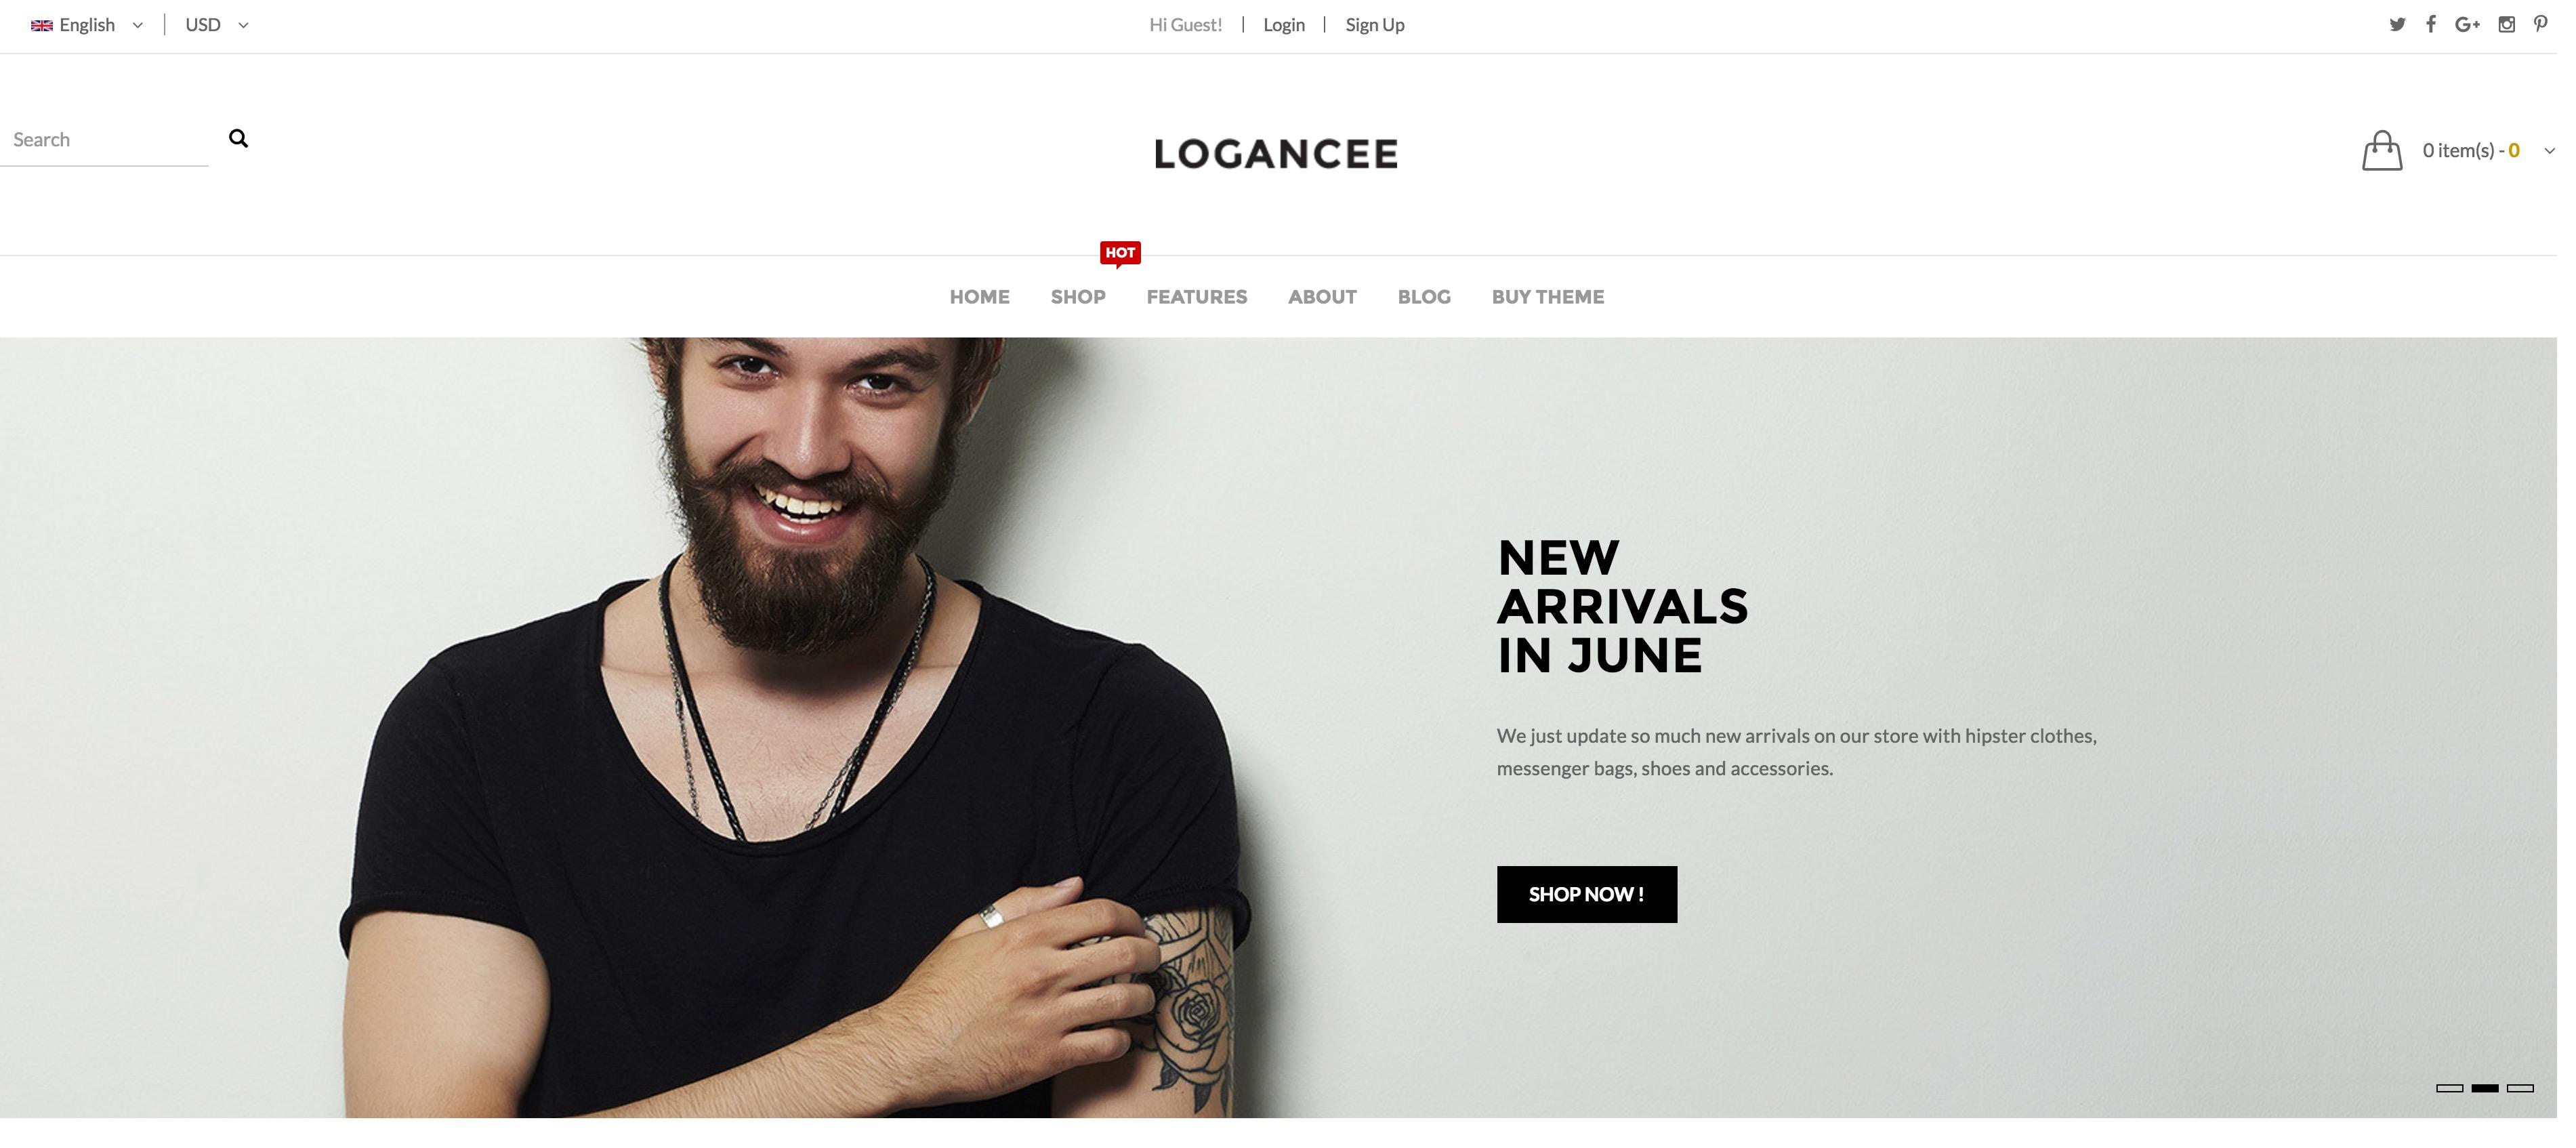 Logancee